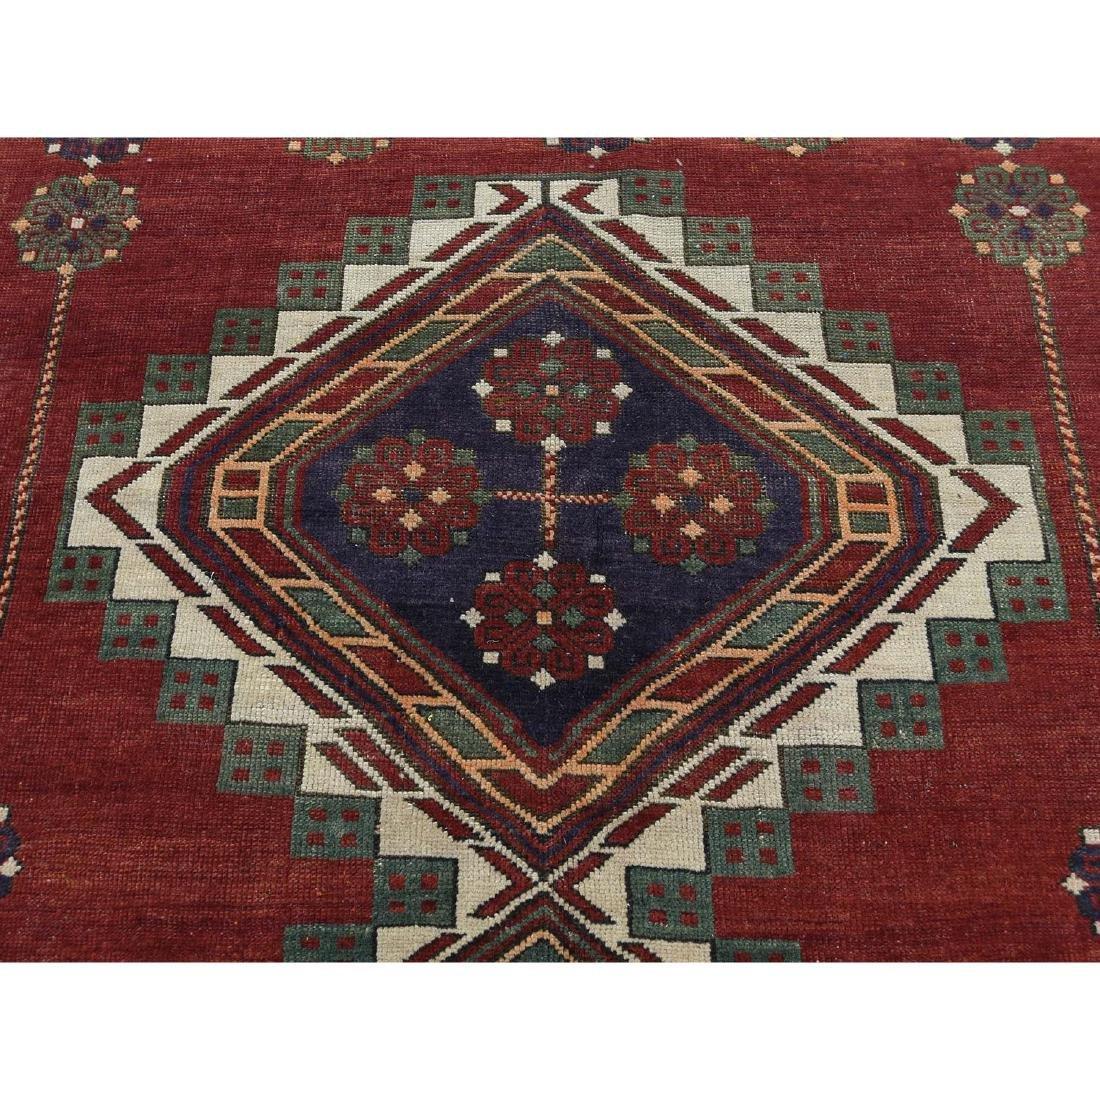 Antique Caucasian Kazak Good Condition Hand Knotted Rug - 9